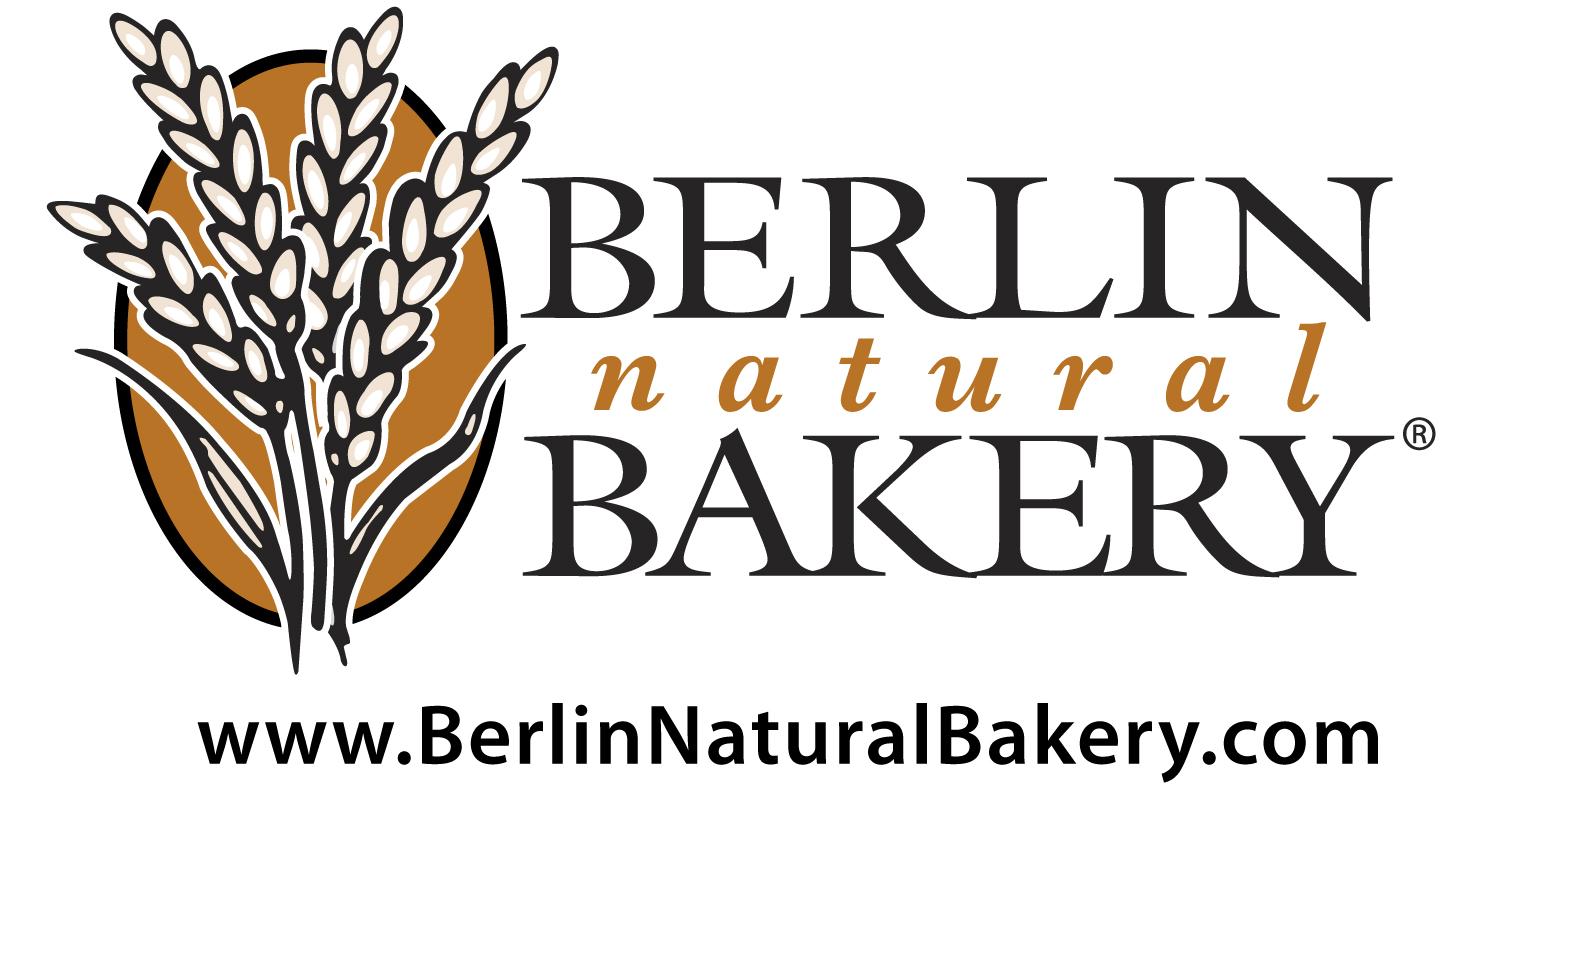 BerlinNaturalBakery_SCVVegFest2019_Vendor.jpg